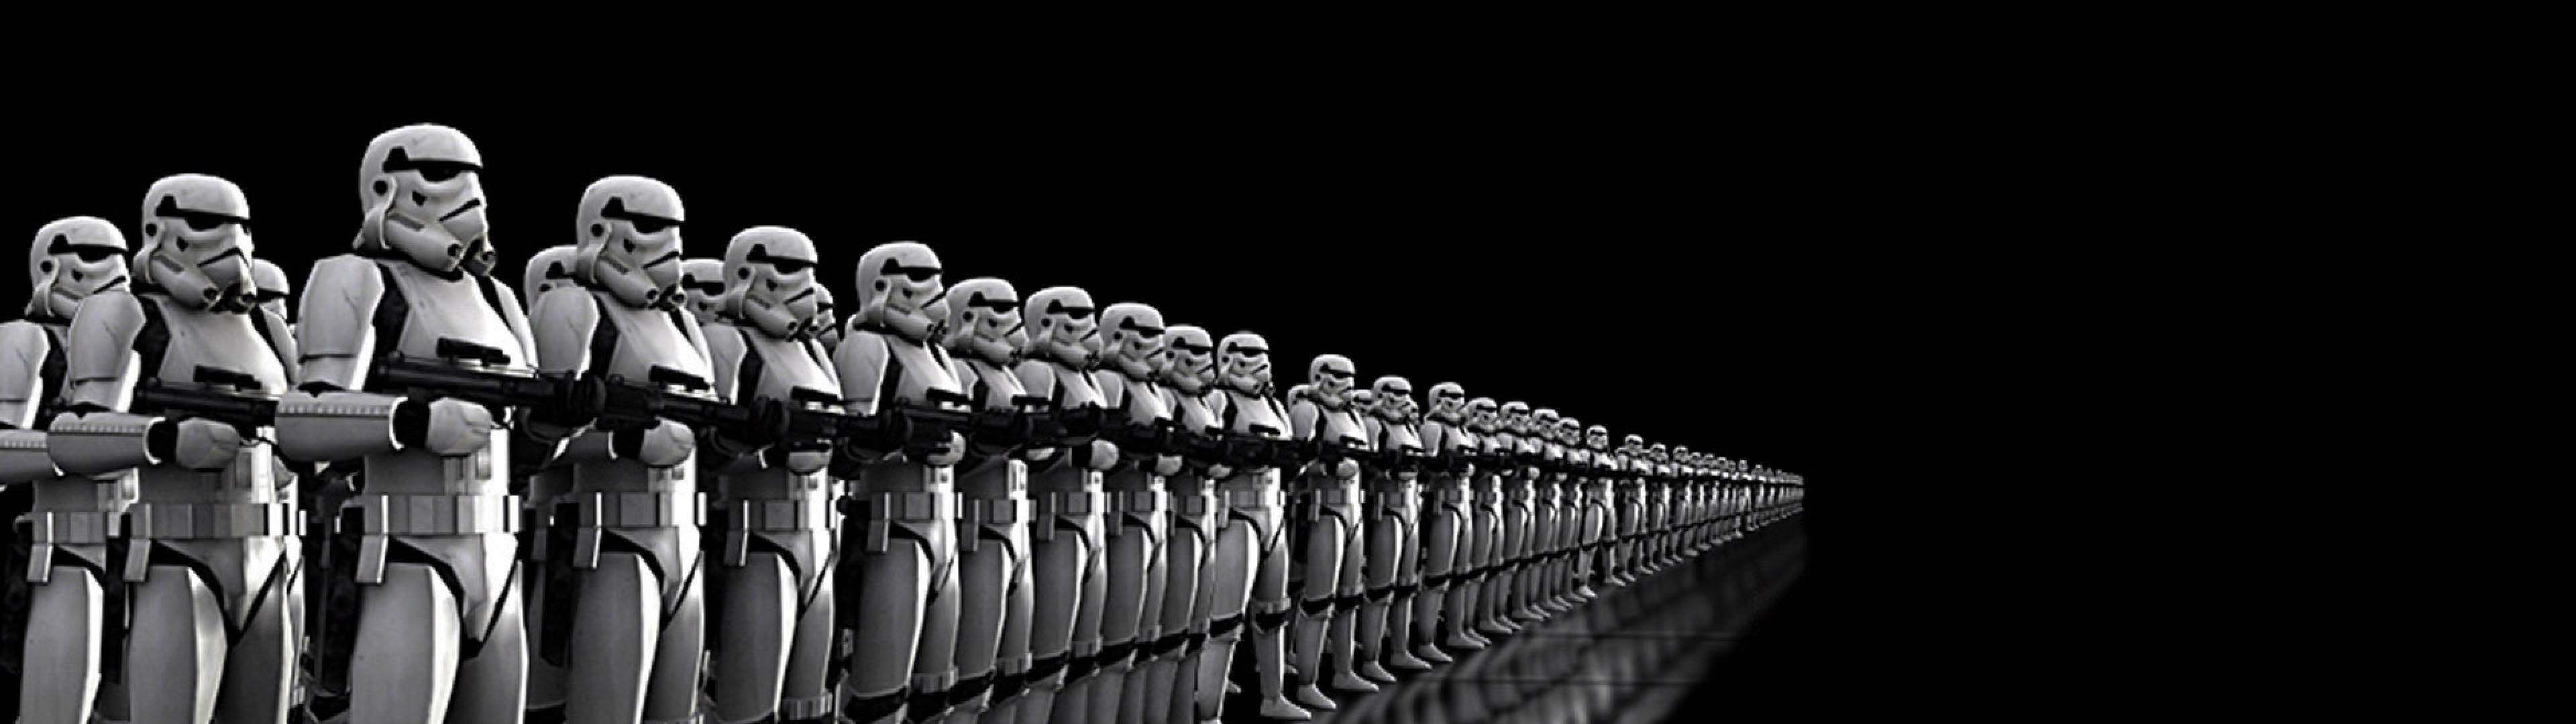 star wars stormtroopers storm troopers HD Wallpaper – Movies & TV .